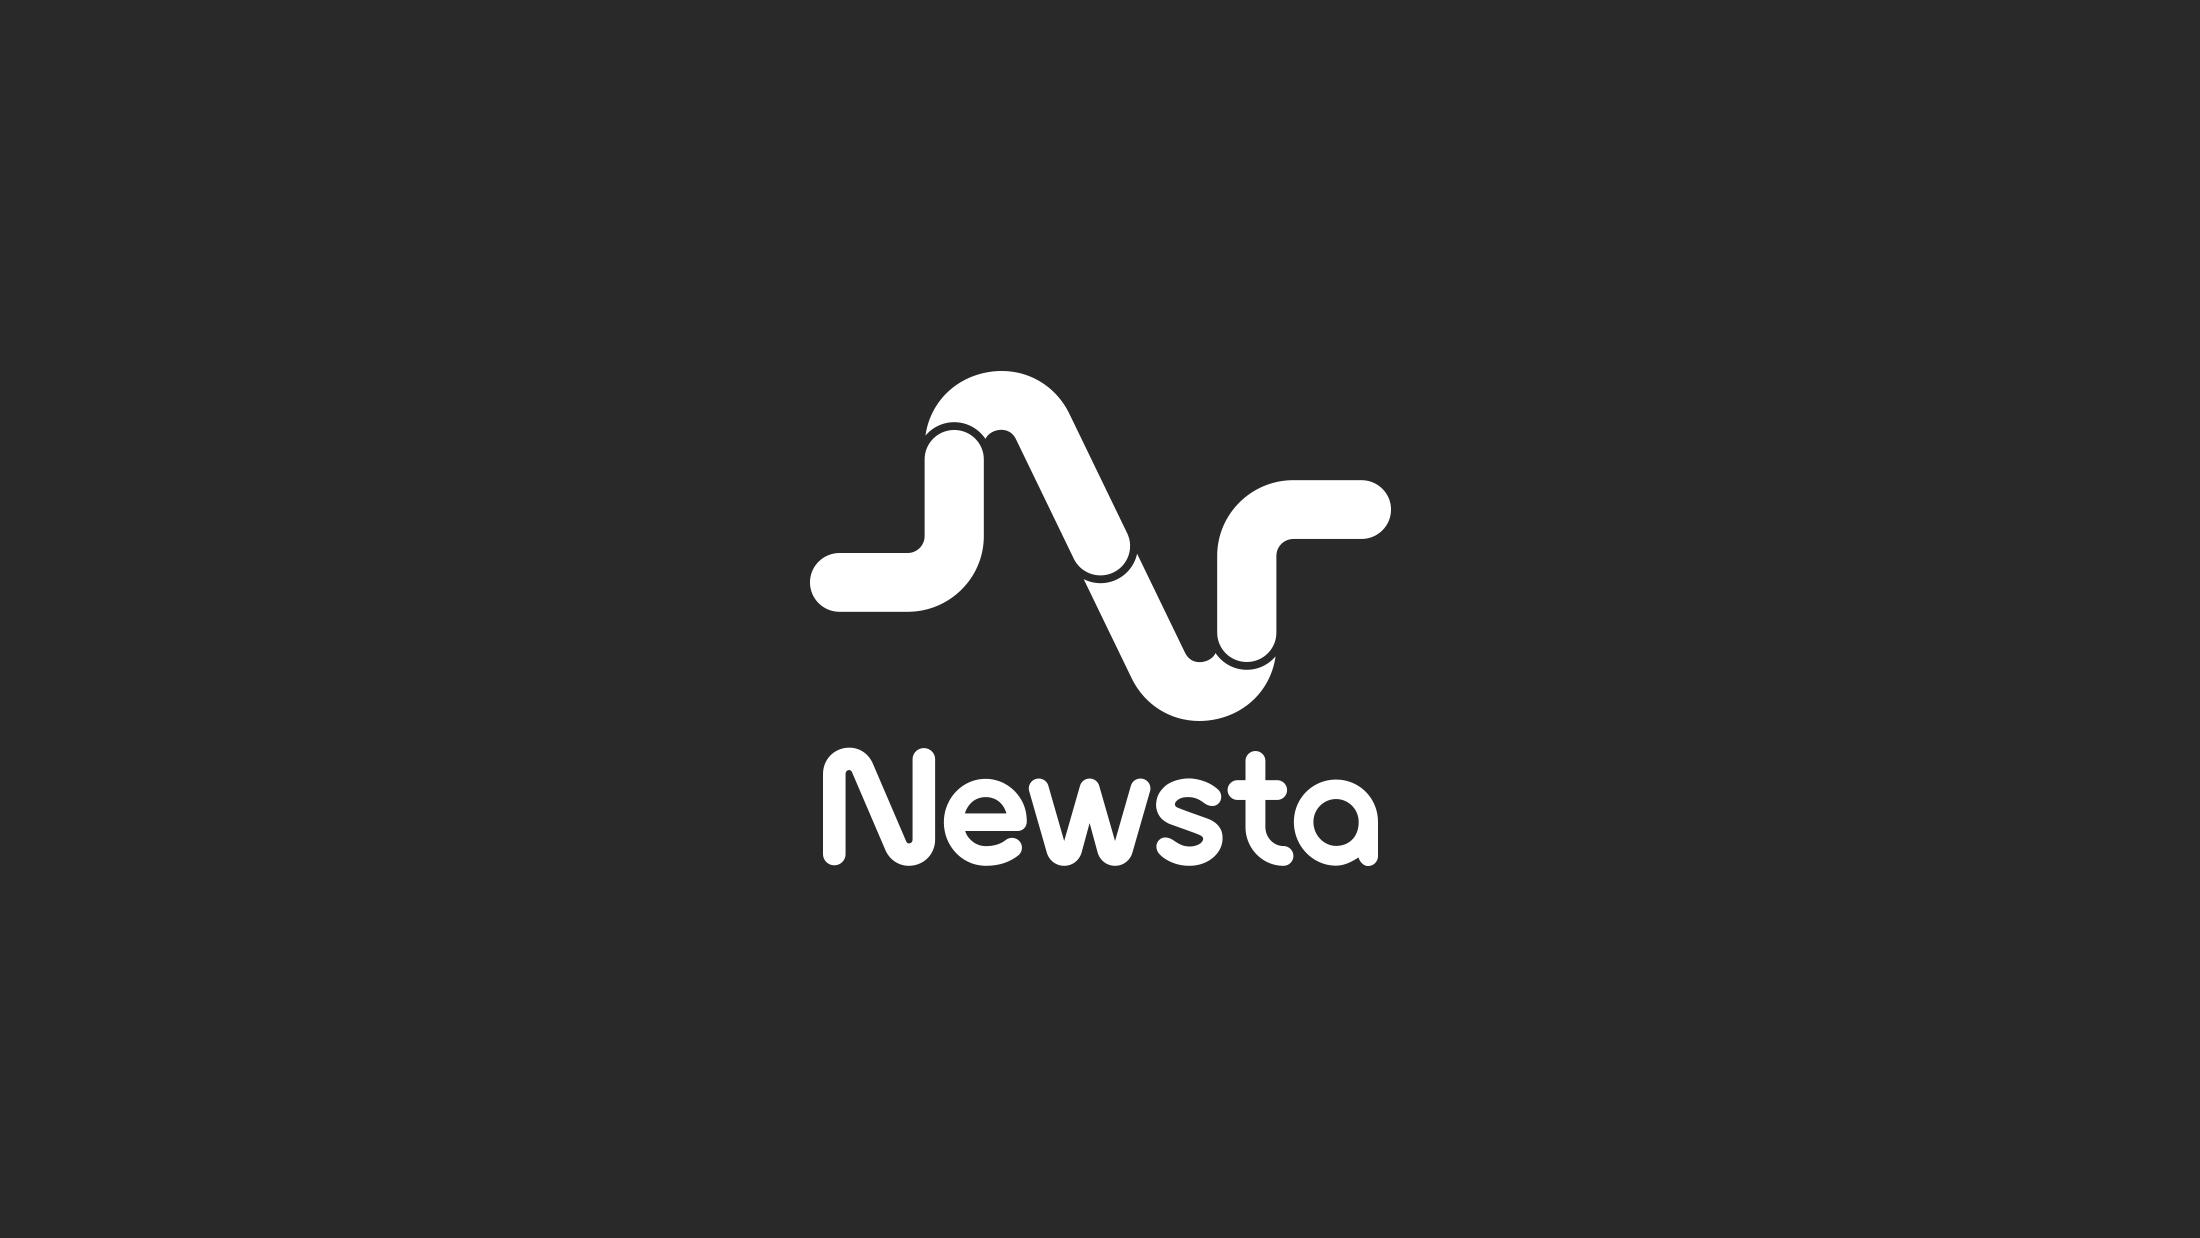 newsta01